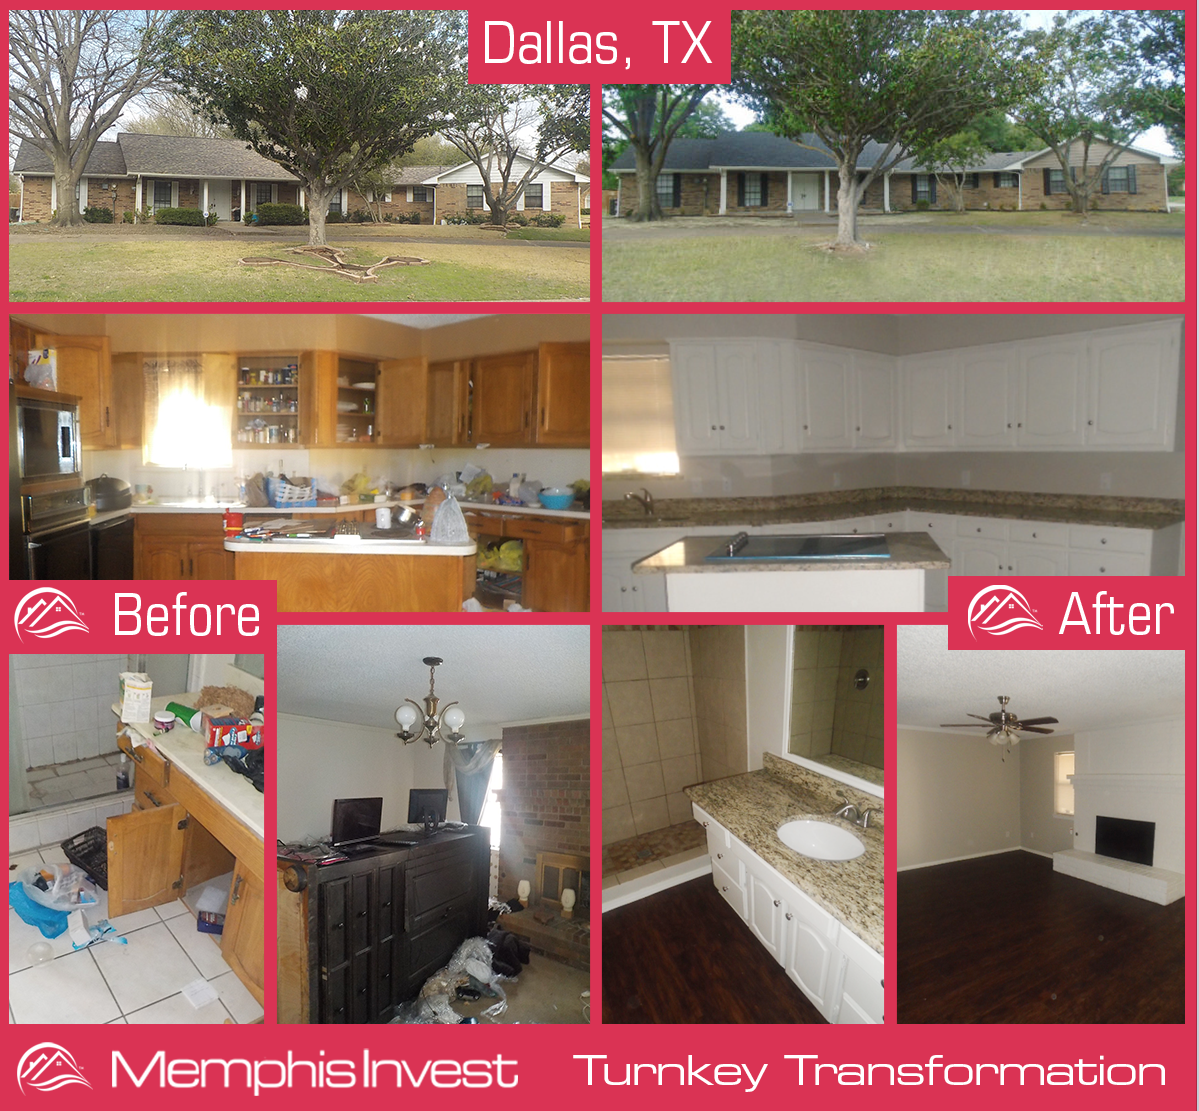 DallasRehab - TurnkeyInvesting